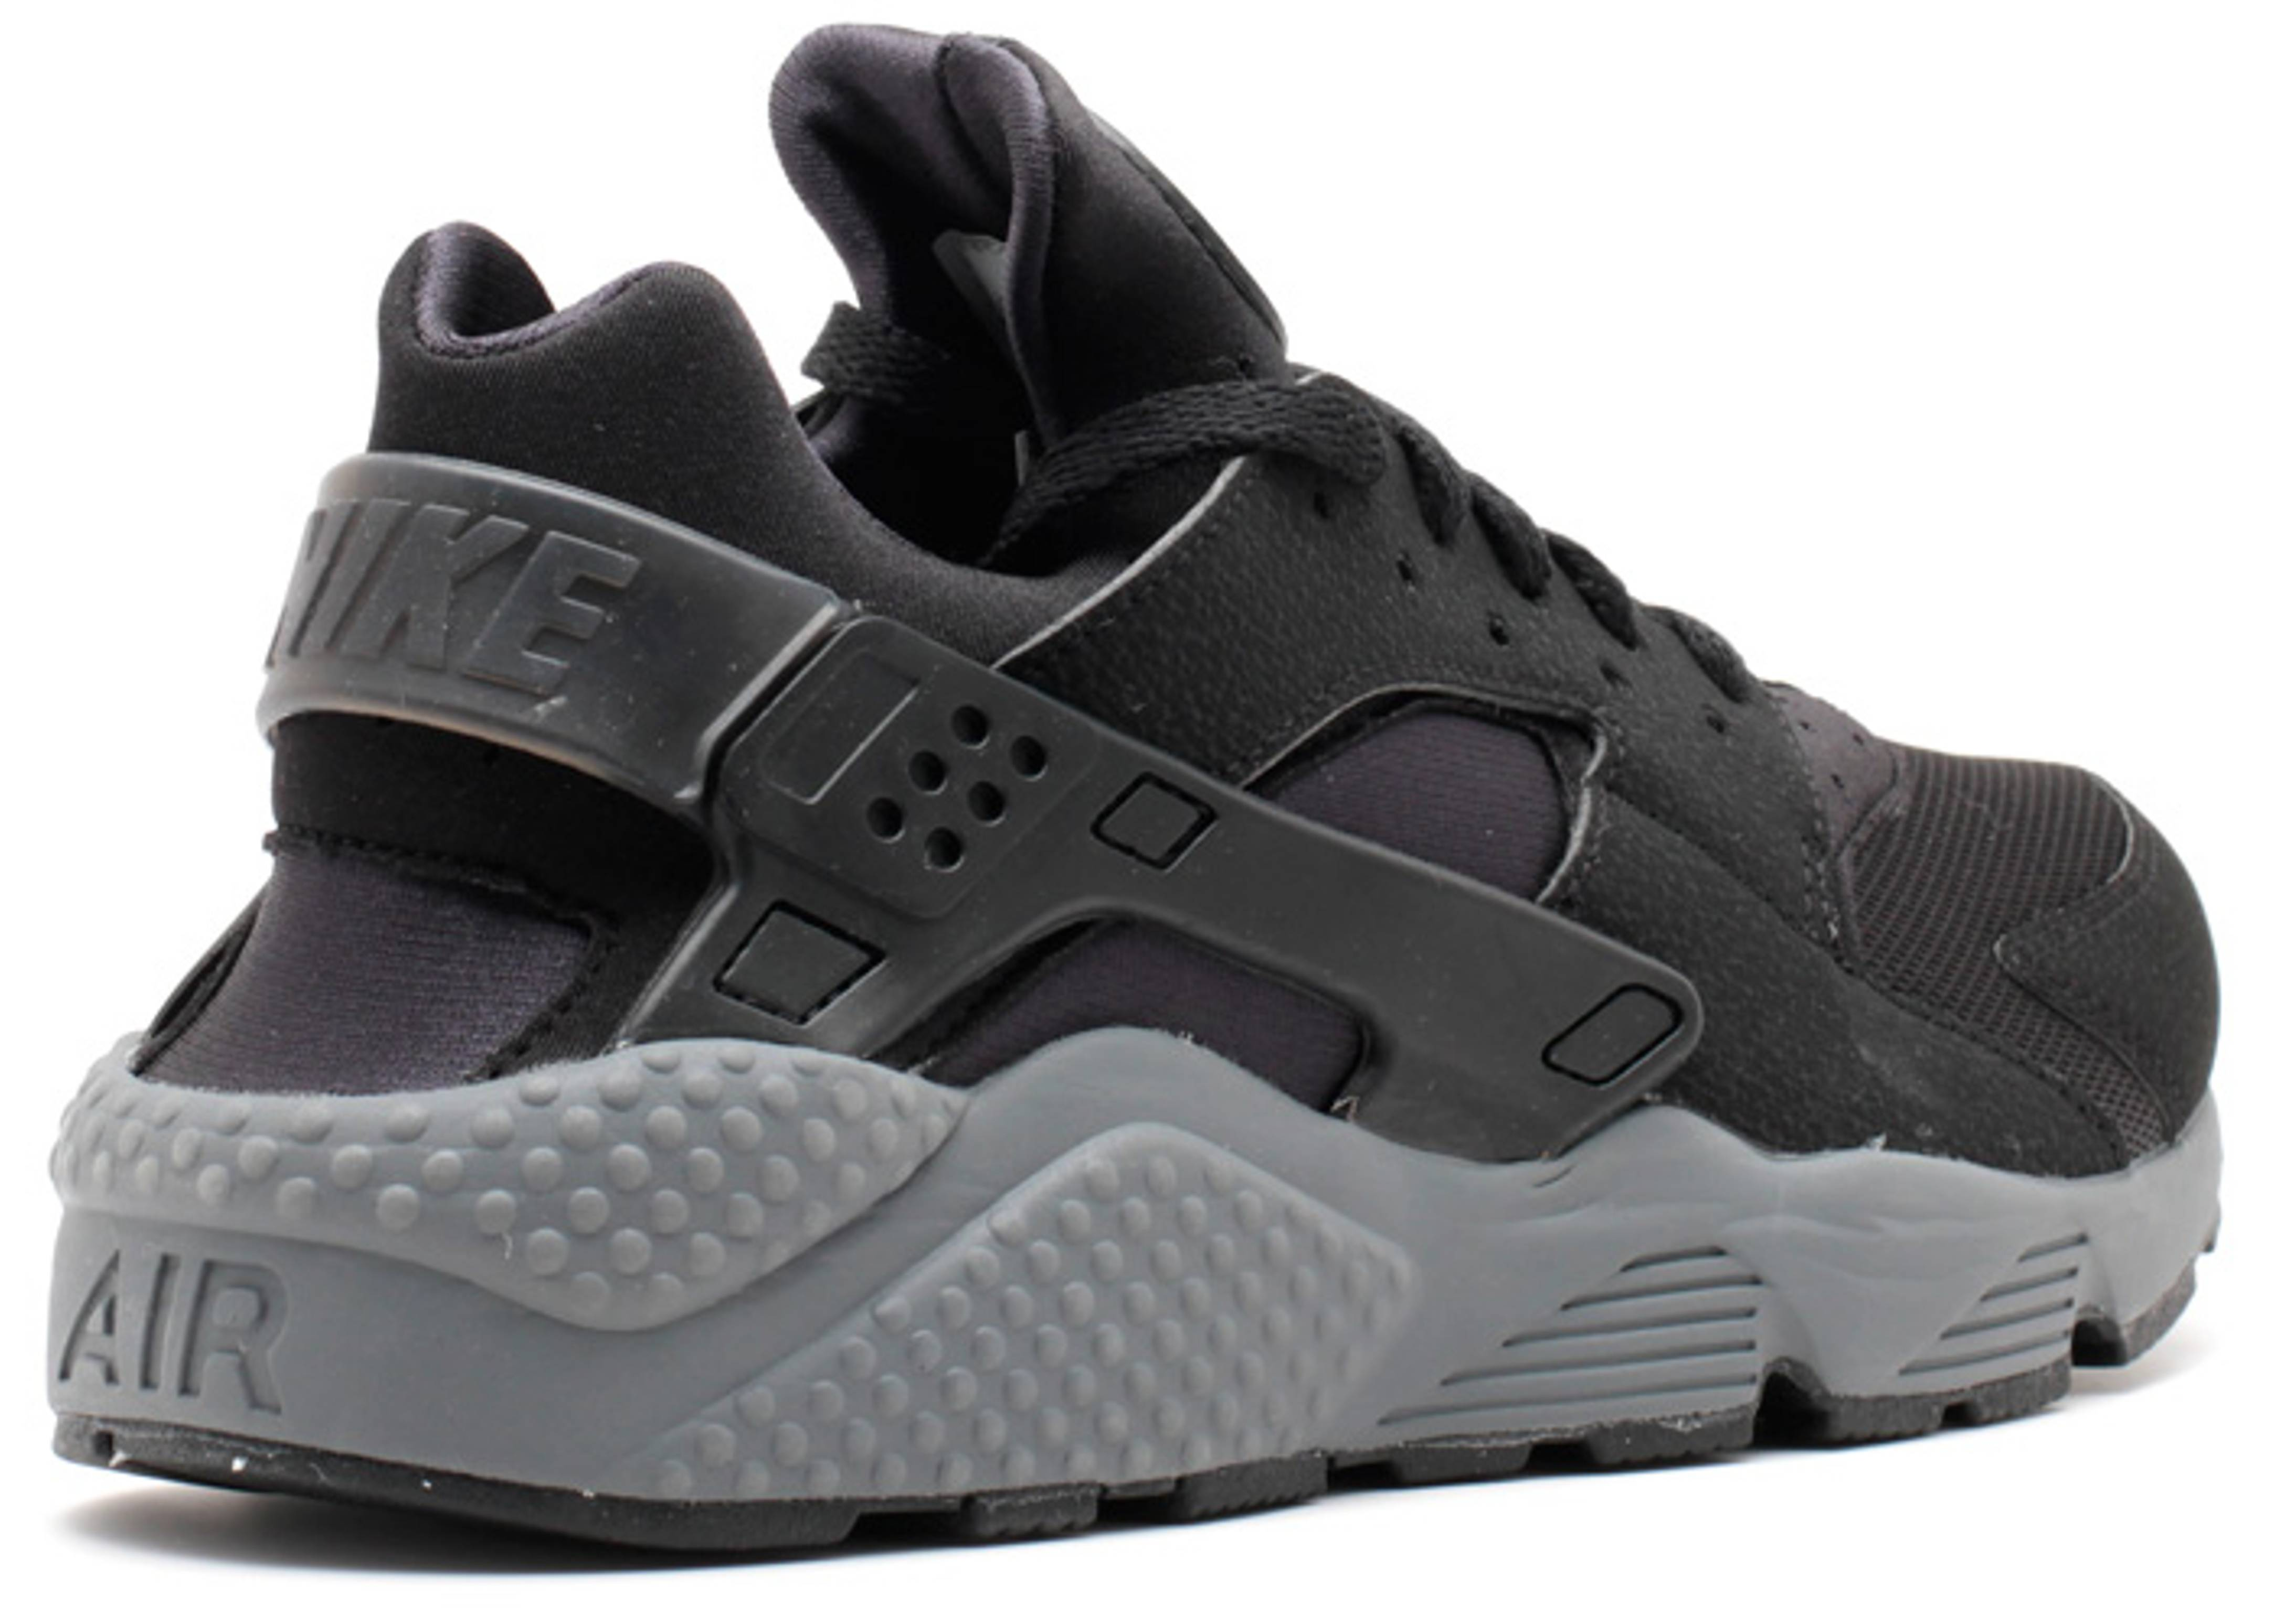 2b03f65f6e15 ... Air Huarache - Nike - 318429 010 - blackblack-black-dark grey Flight  Club ...